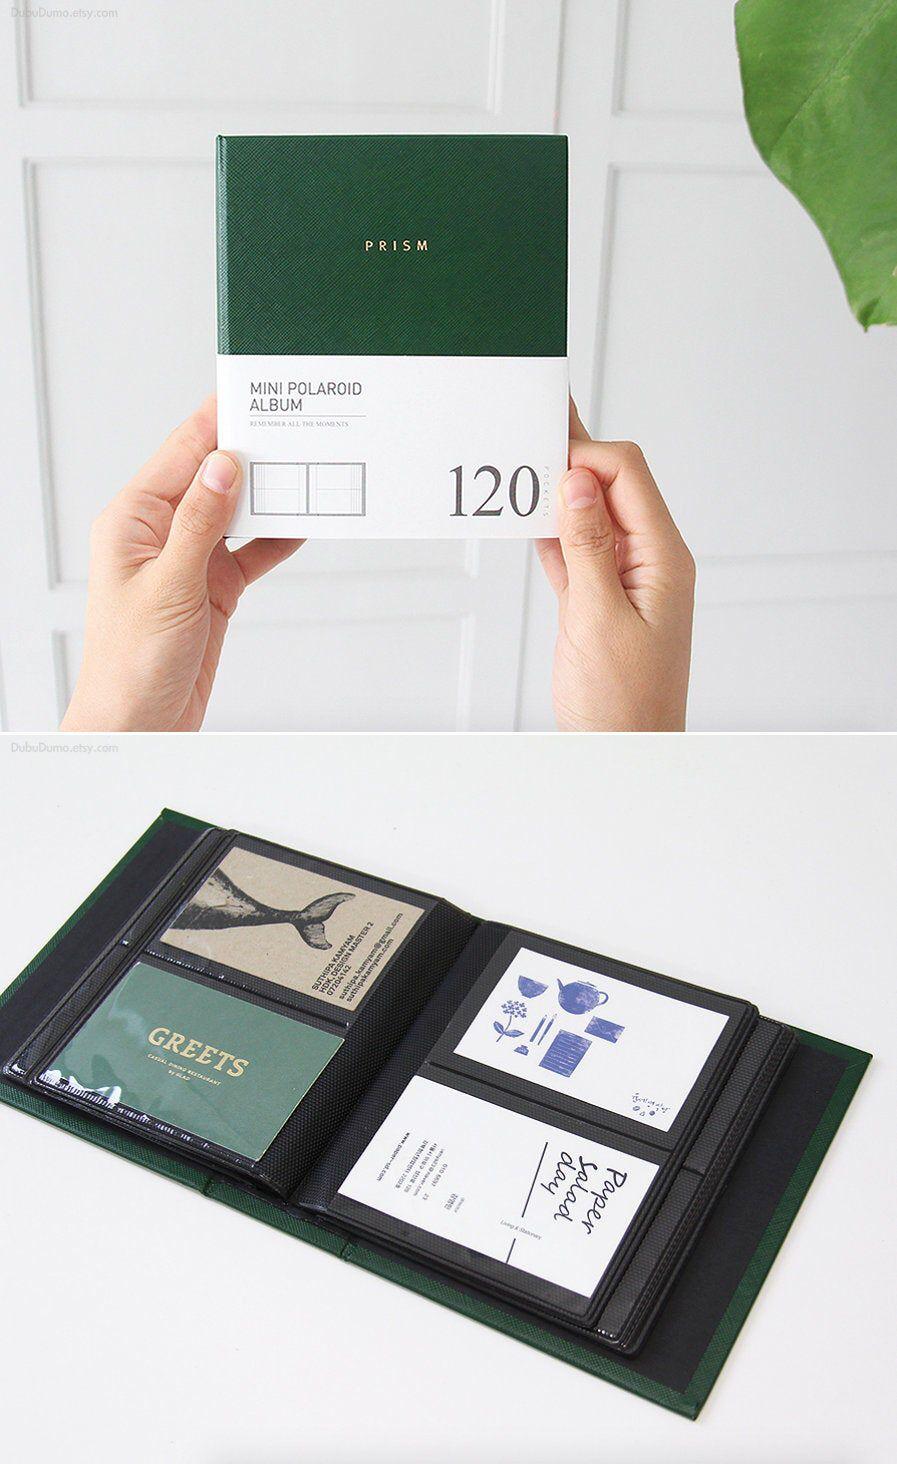 Instax mini album 120pockets business card book photo